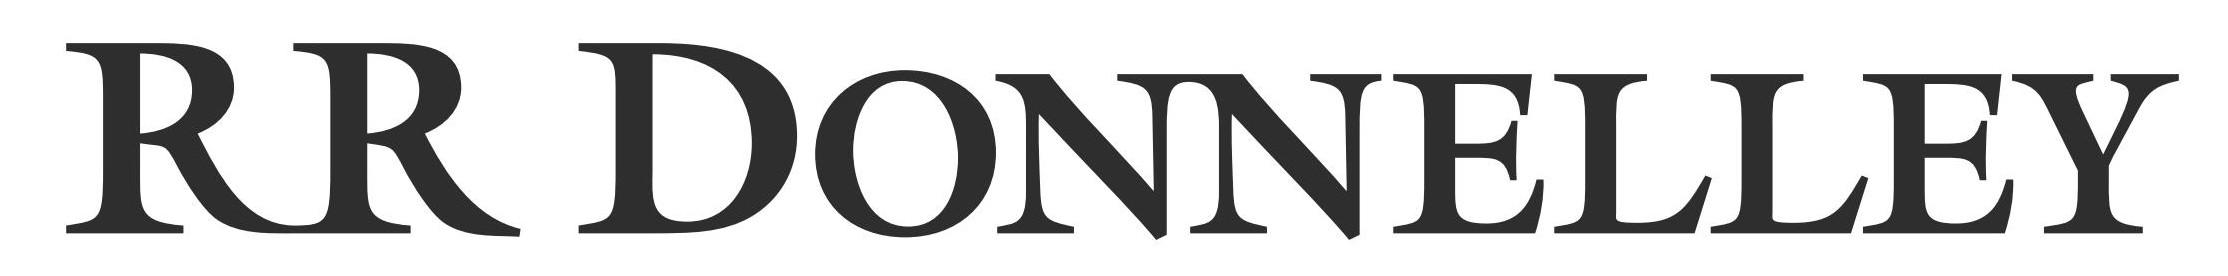 RR Donnelley Logo [EPS File] png